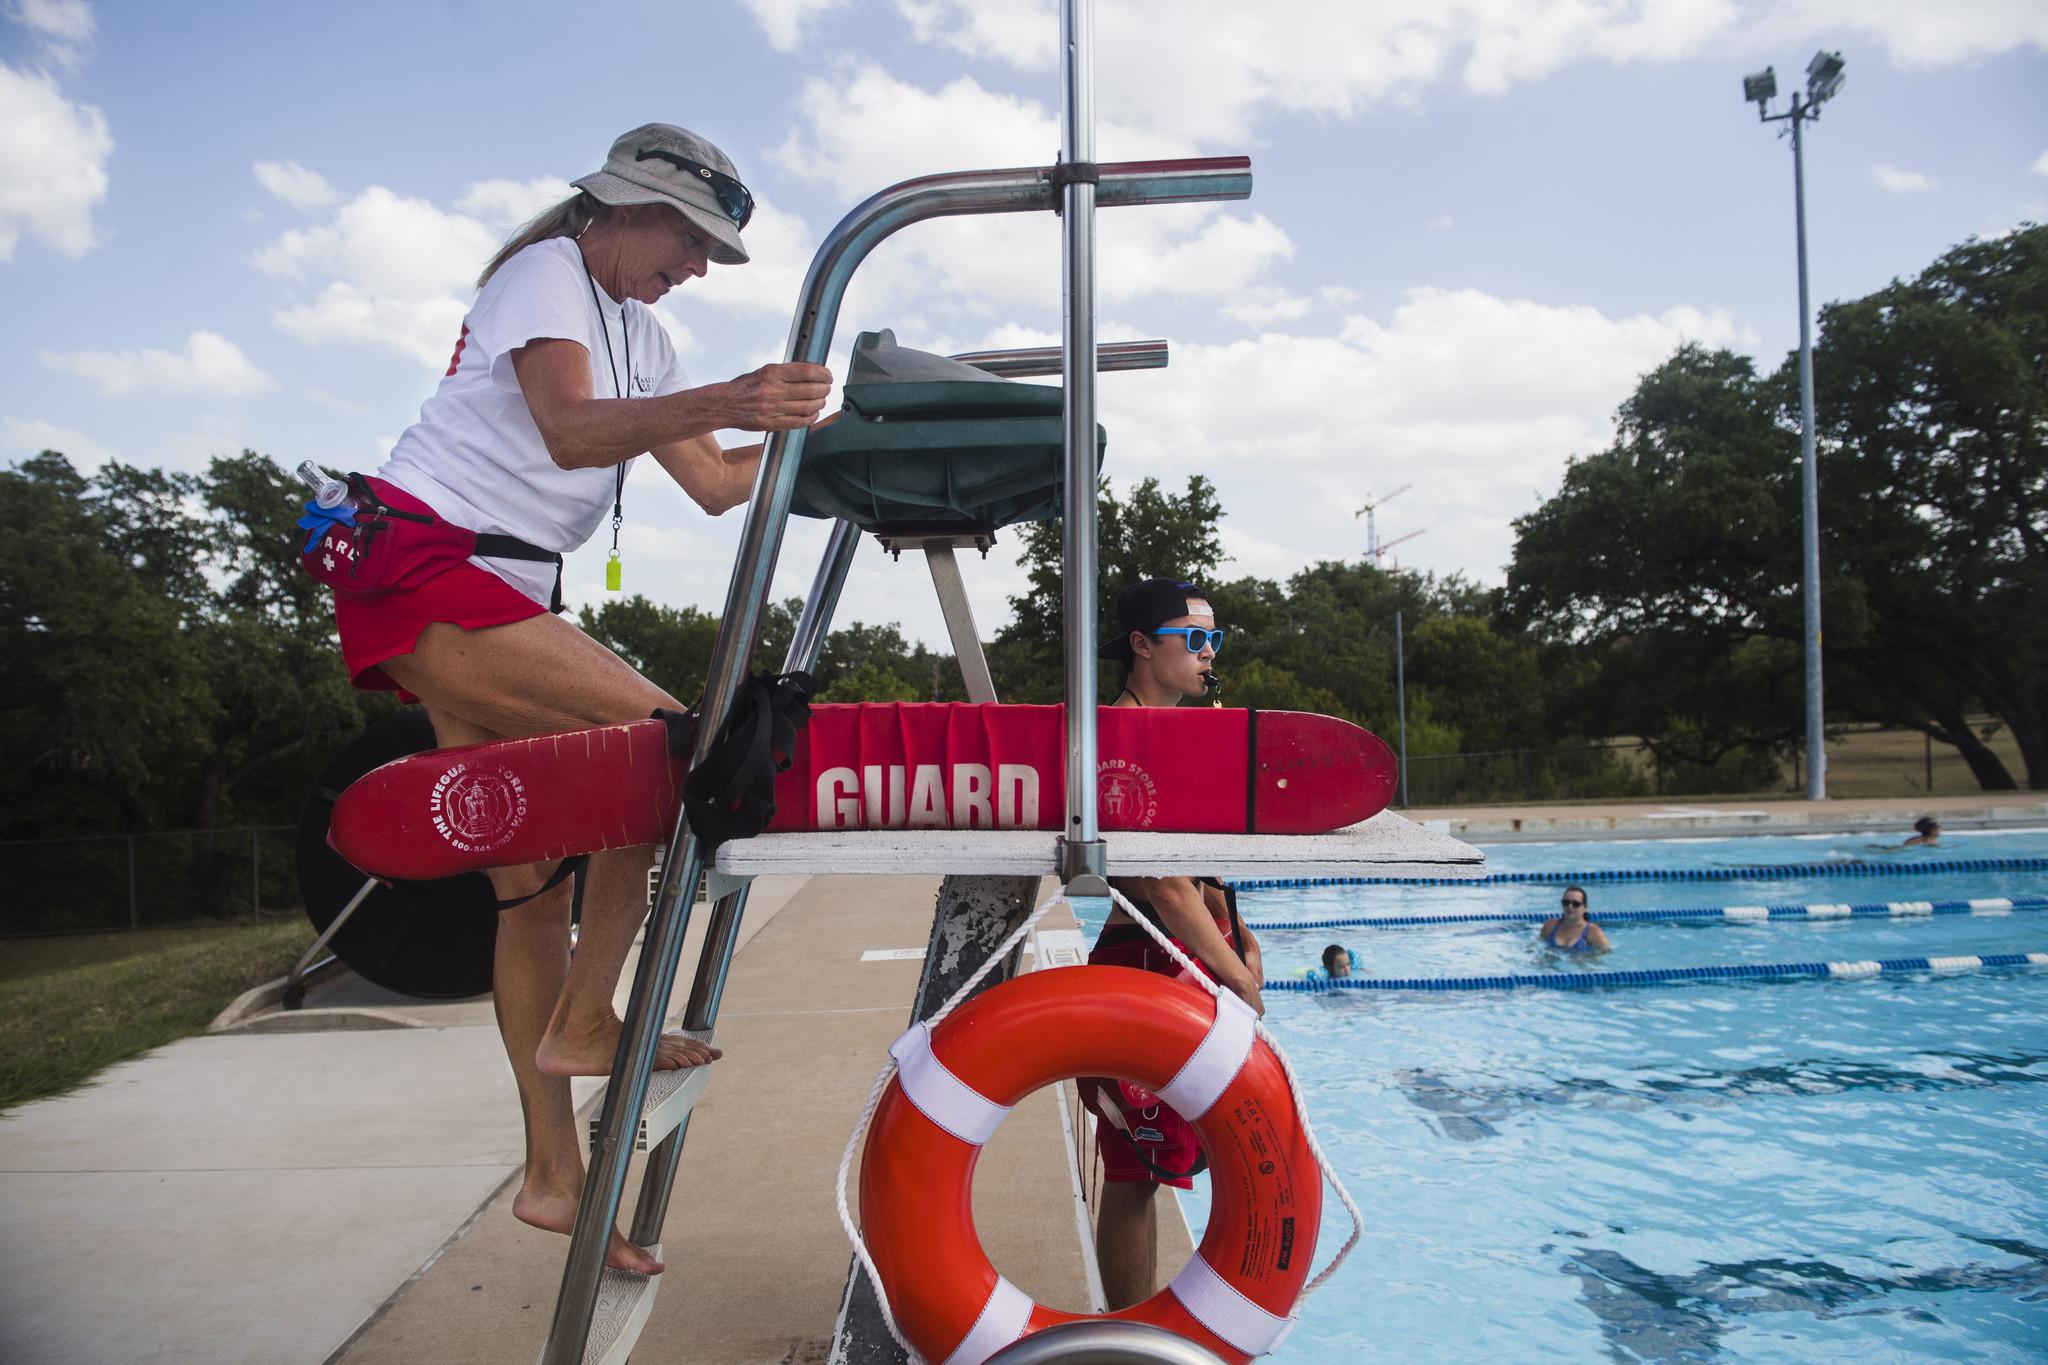 Lifeguard Training Course 2017 - Camp America